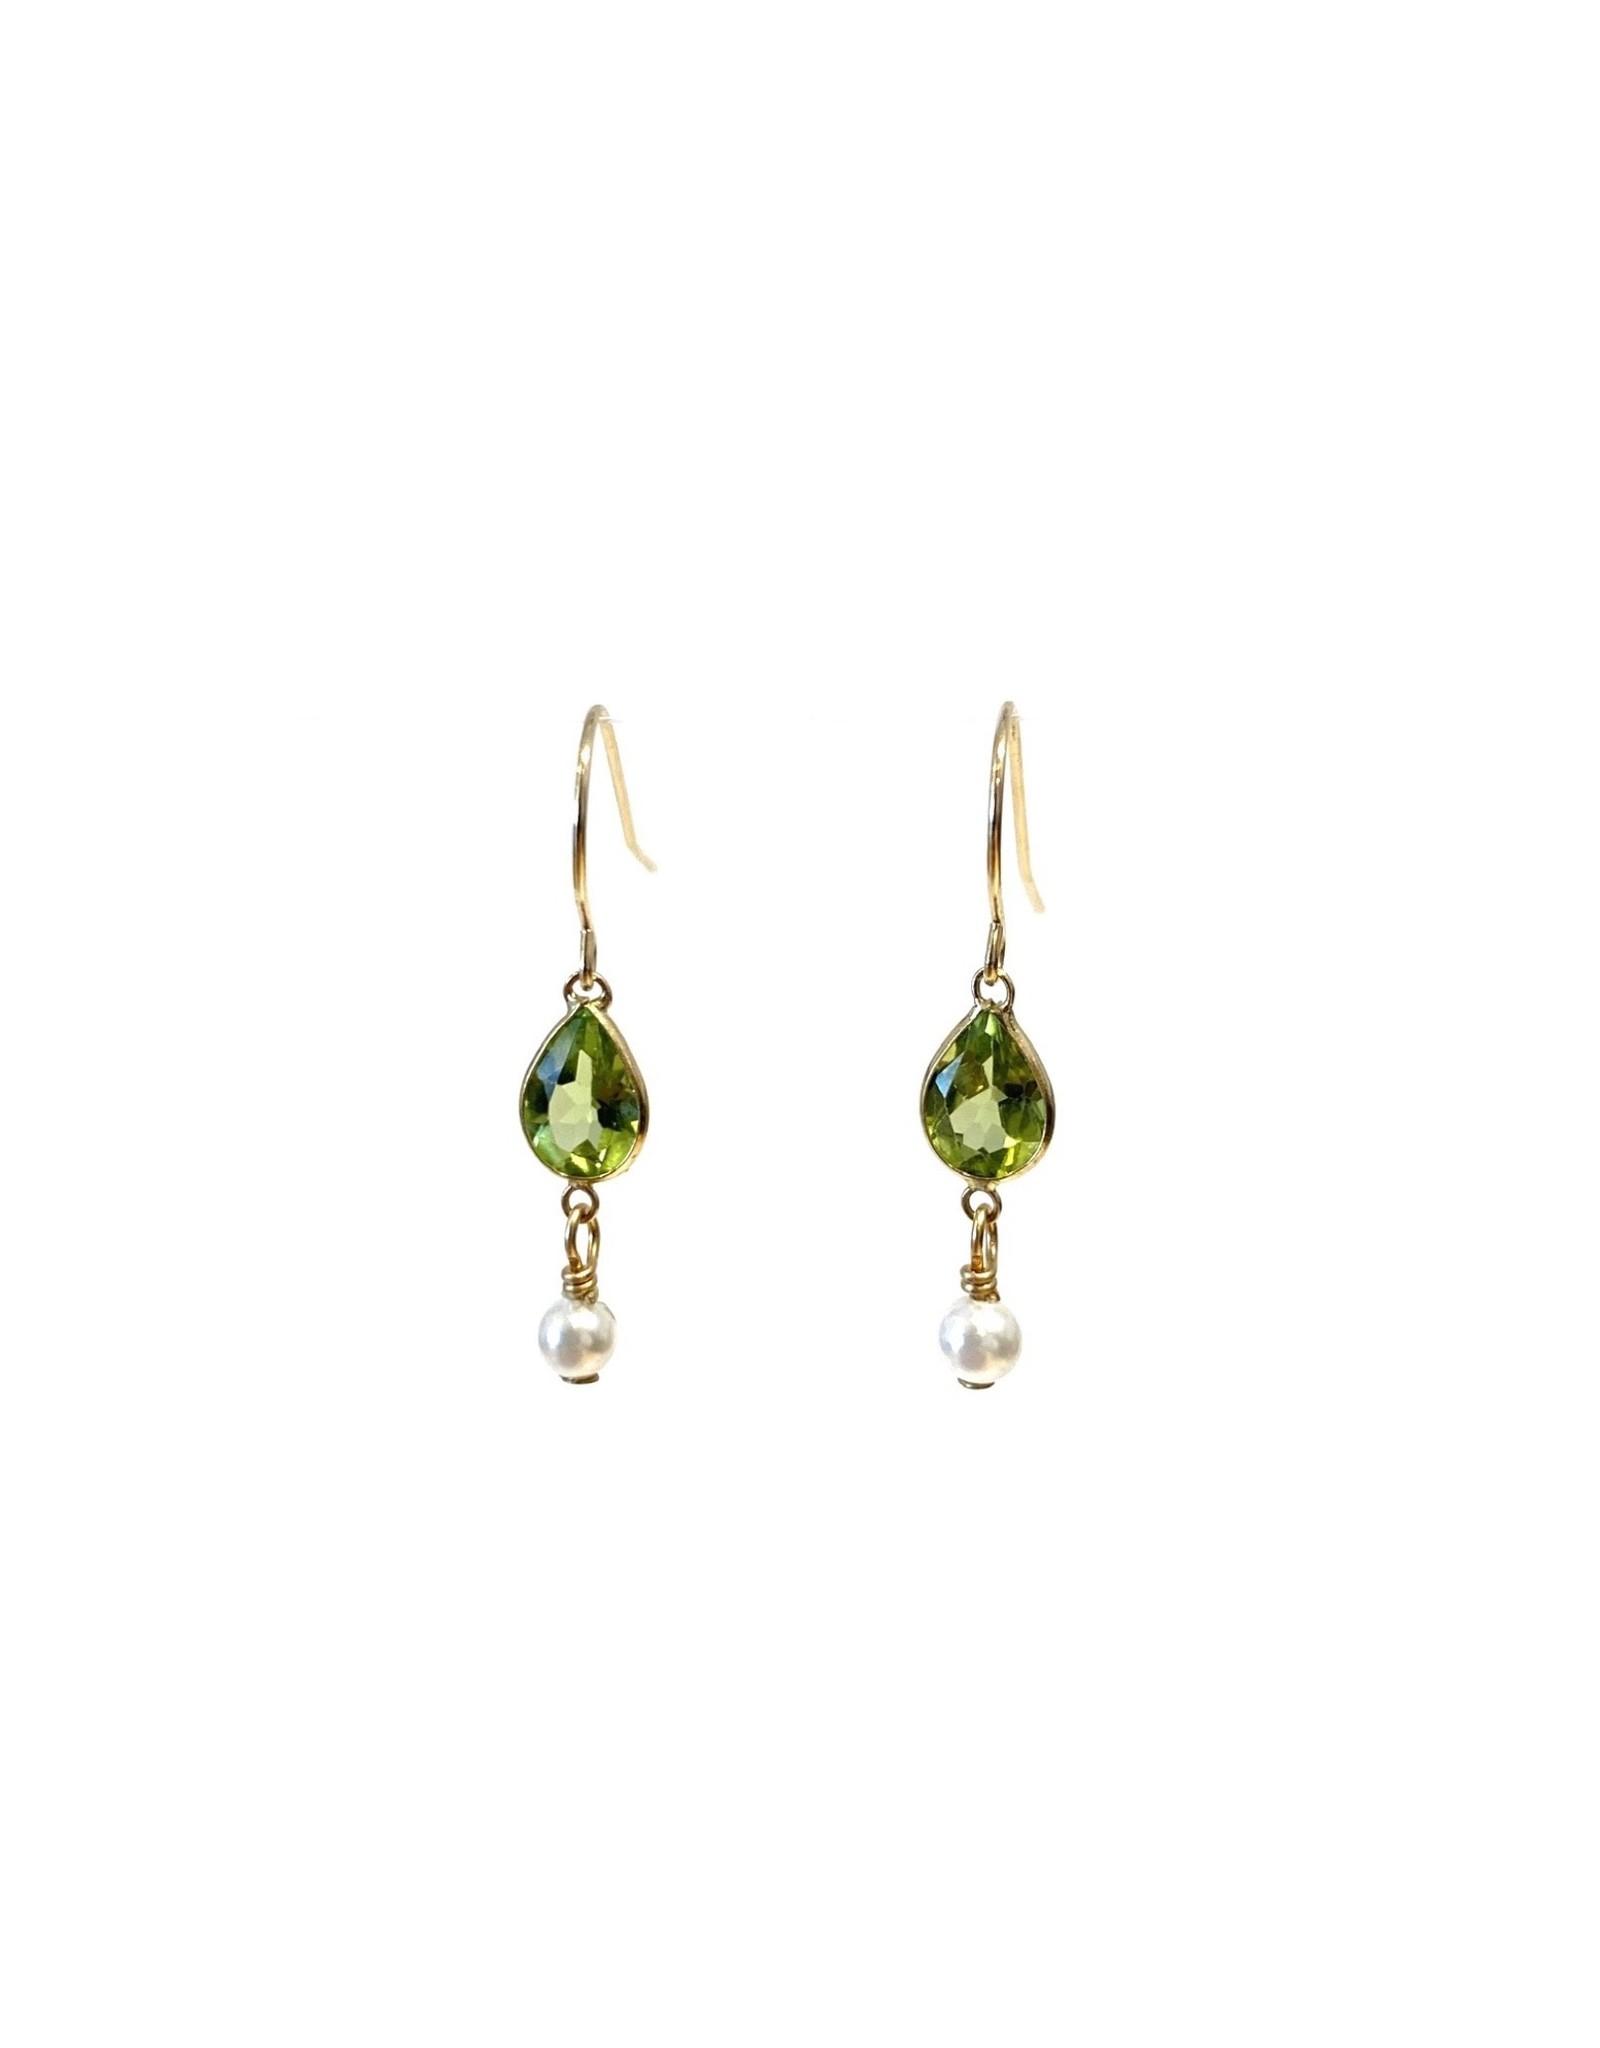 Bo Gold Earrings - Gold - Peridot